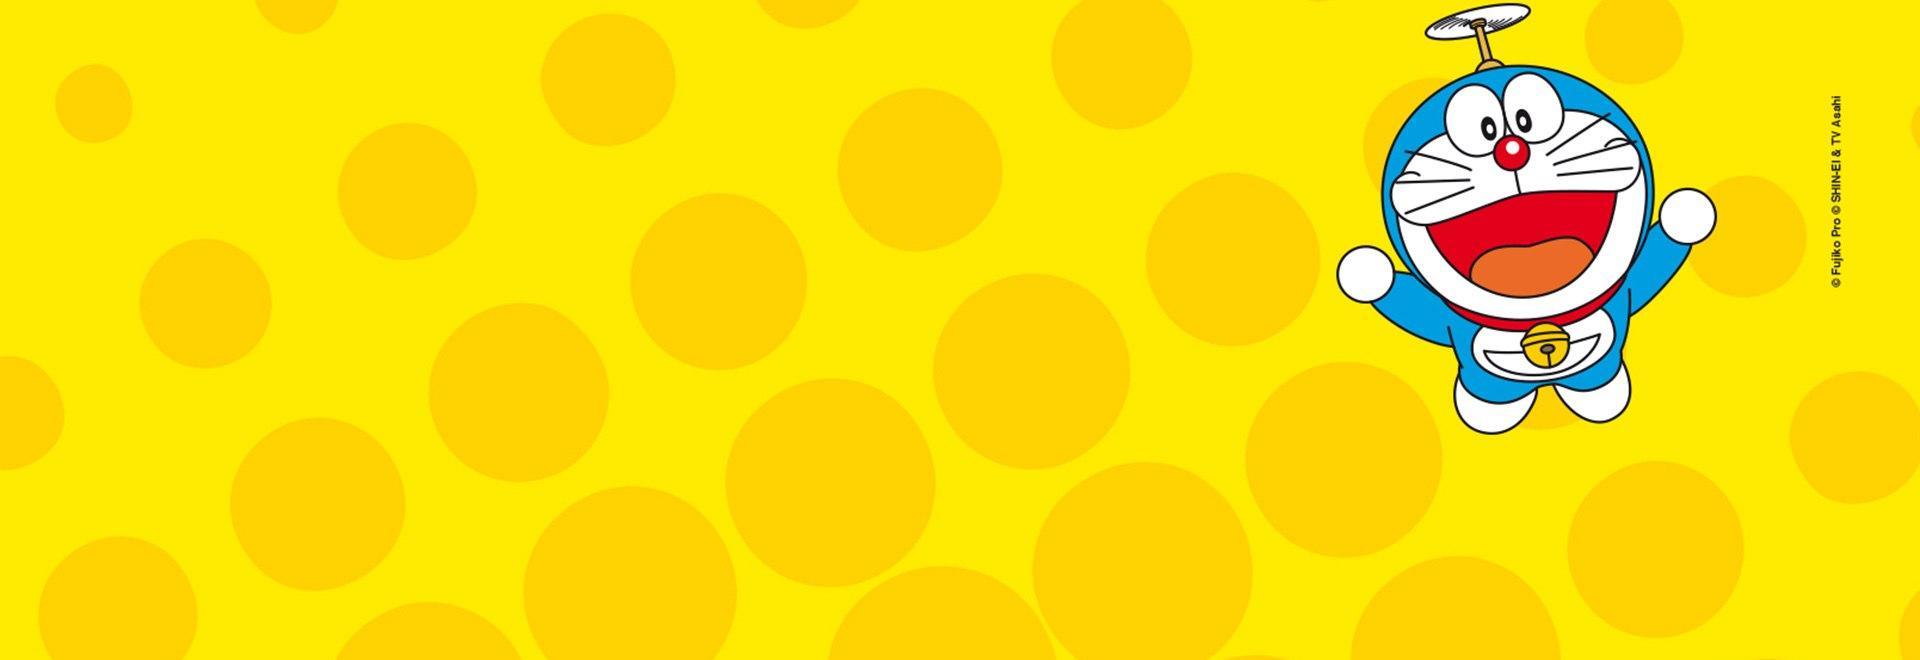 Ombrelli spassosi / Bastone camomilla